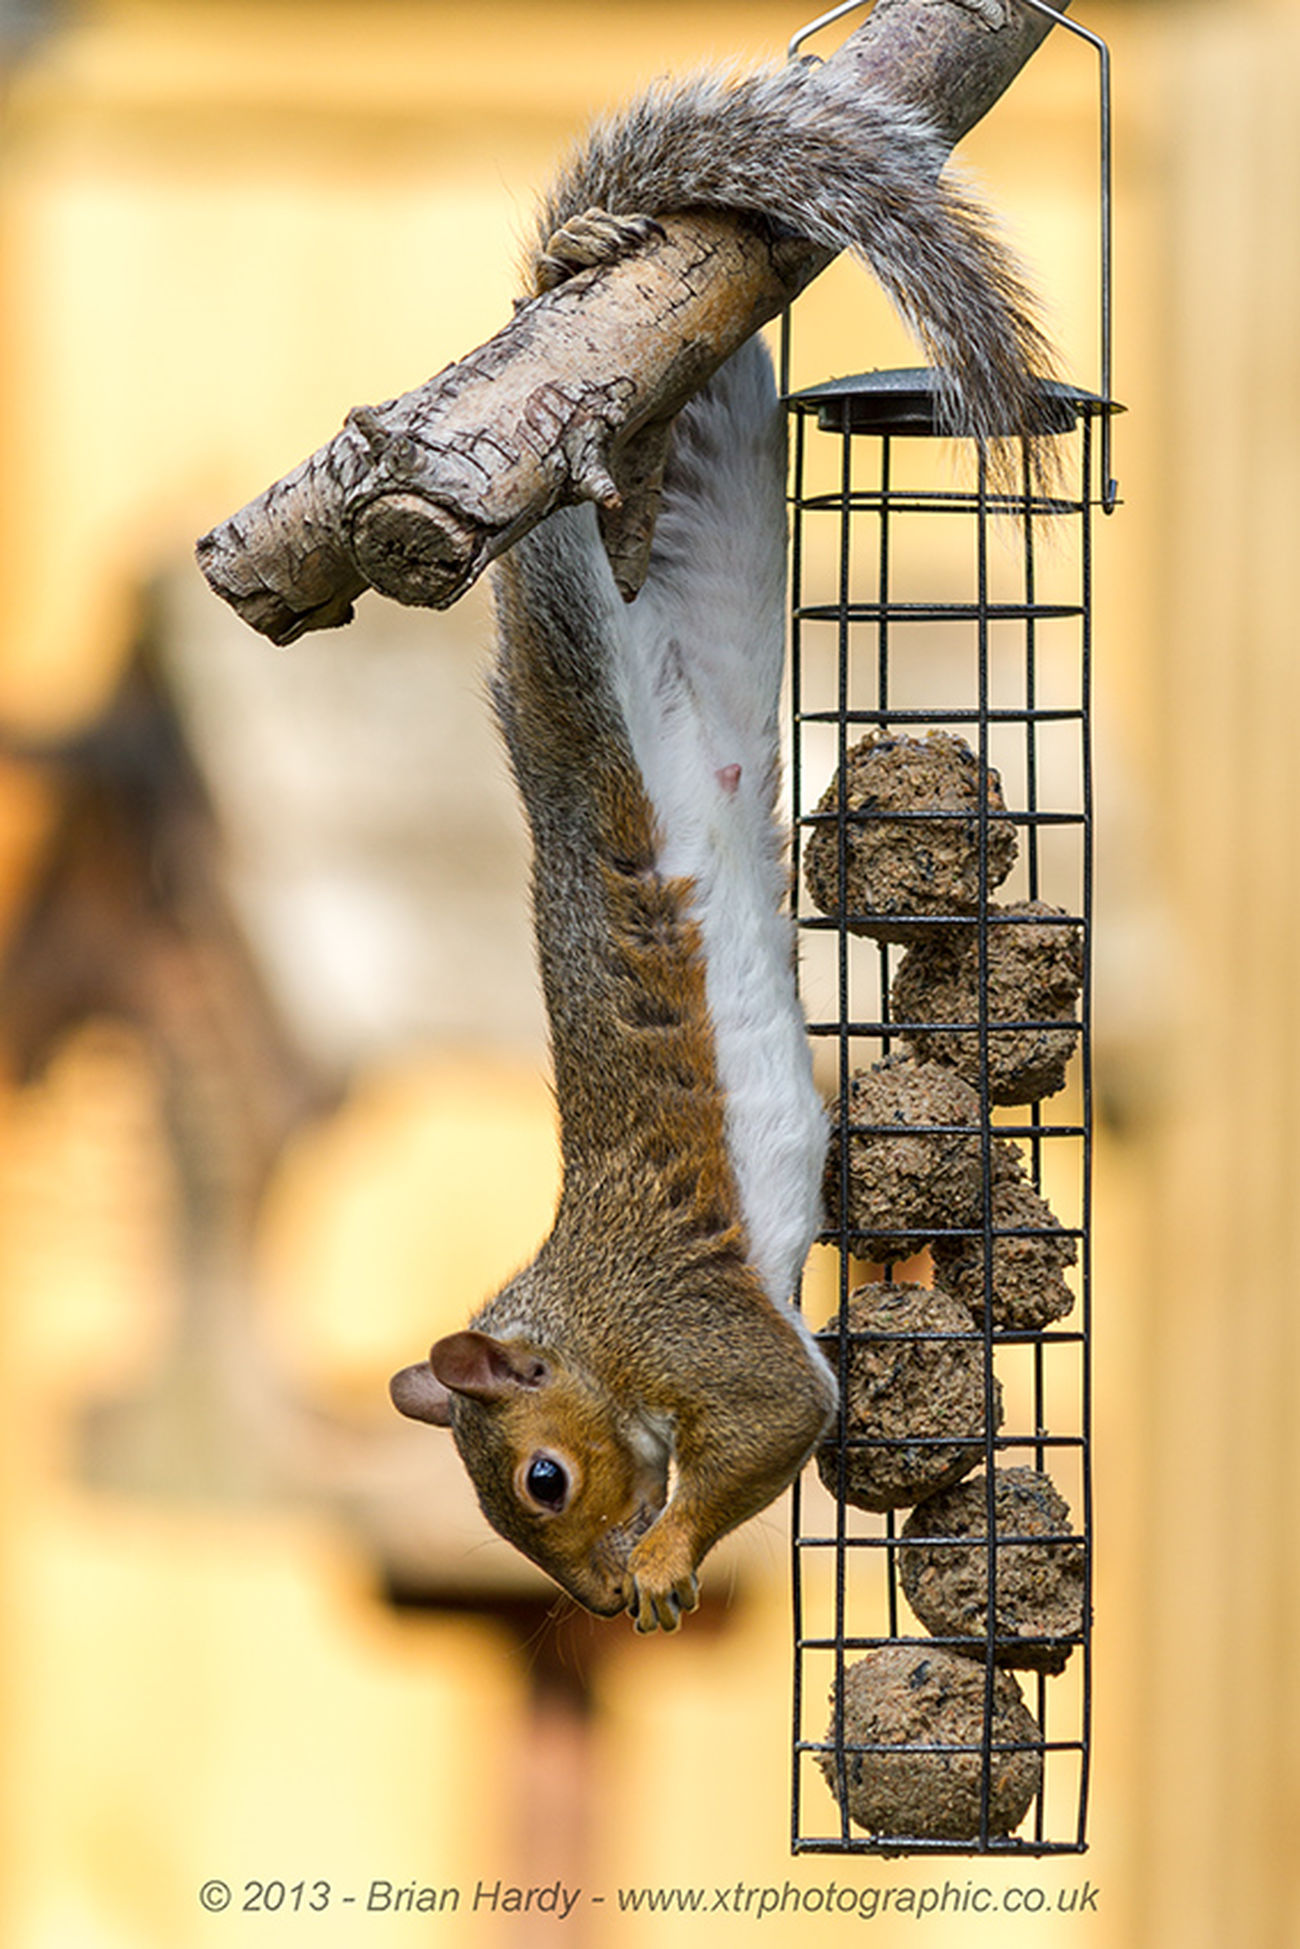 Feeding Time. Animal Wildlife Nature One Animal Outdoors Squirrel